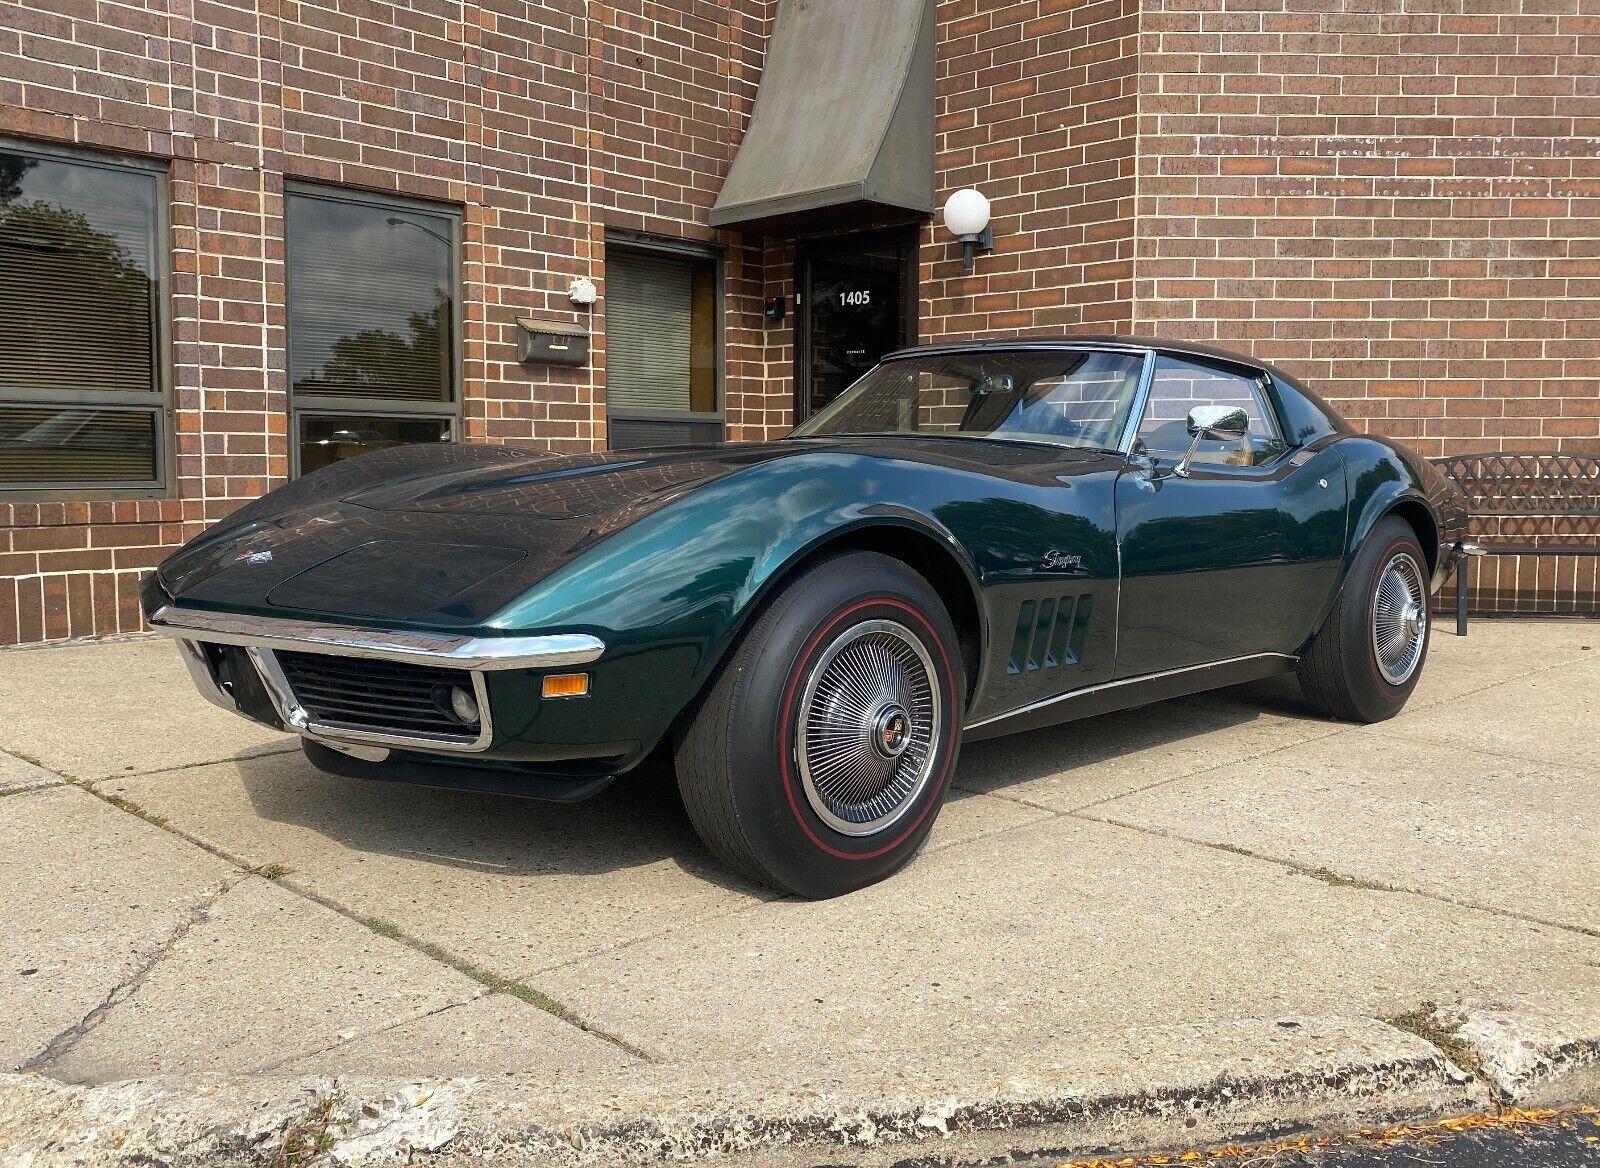 1969 Green Chevrolet Corvette     C3 Corvette Photo 1